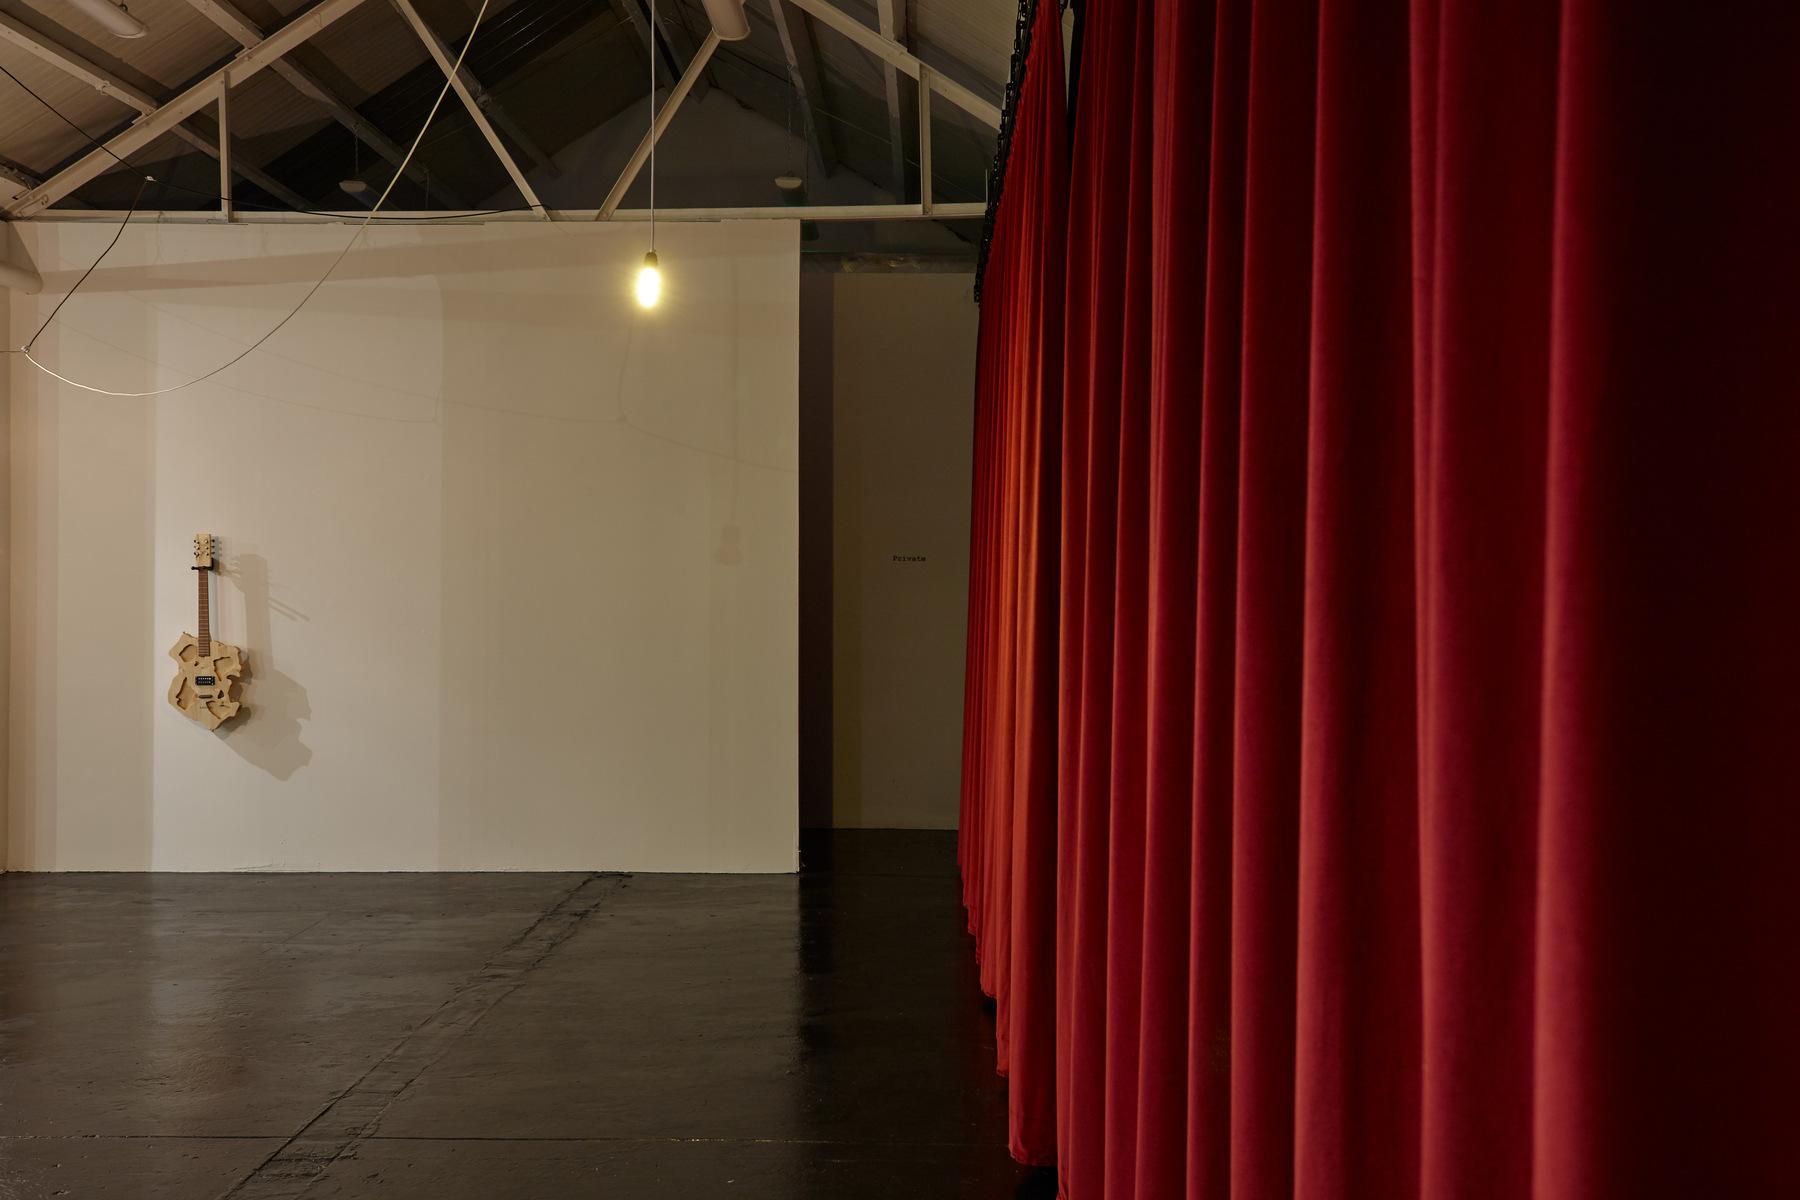 Flavio Merlo - Curtain, 2015